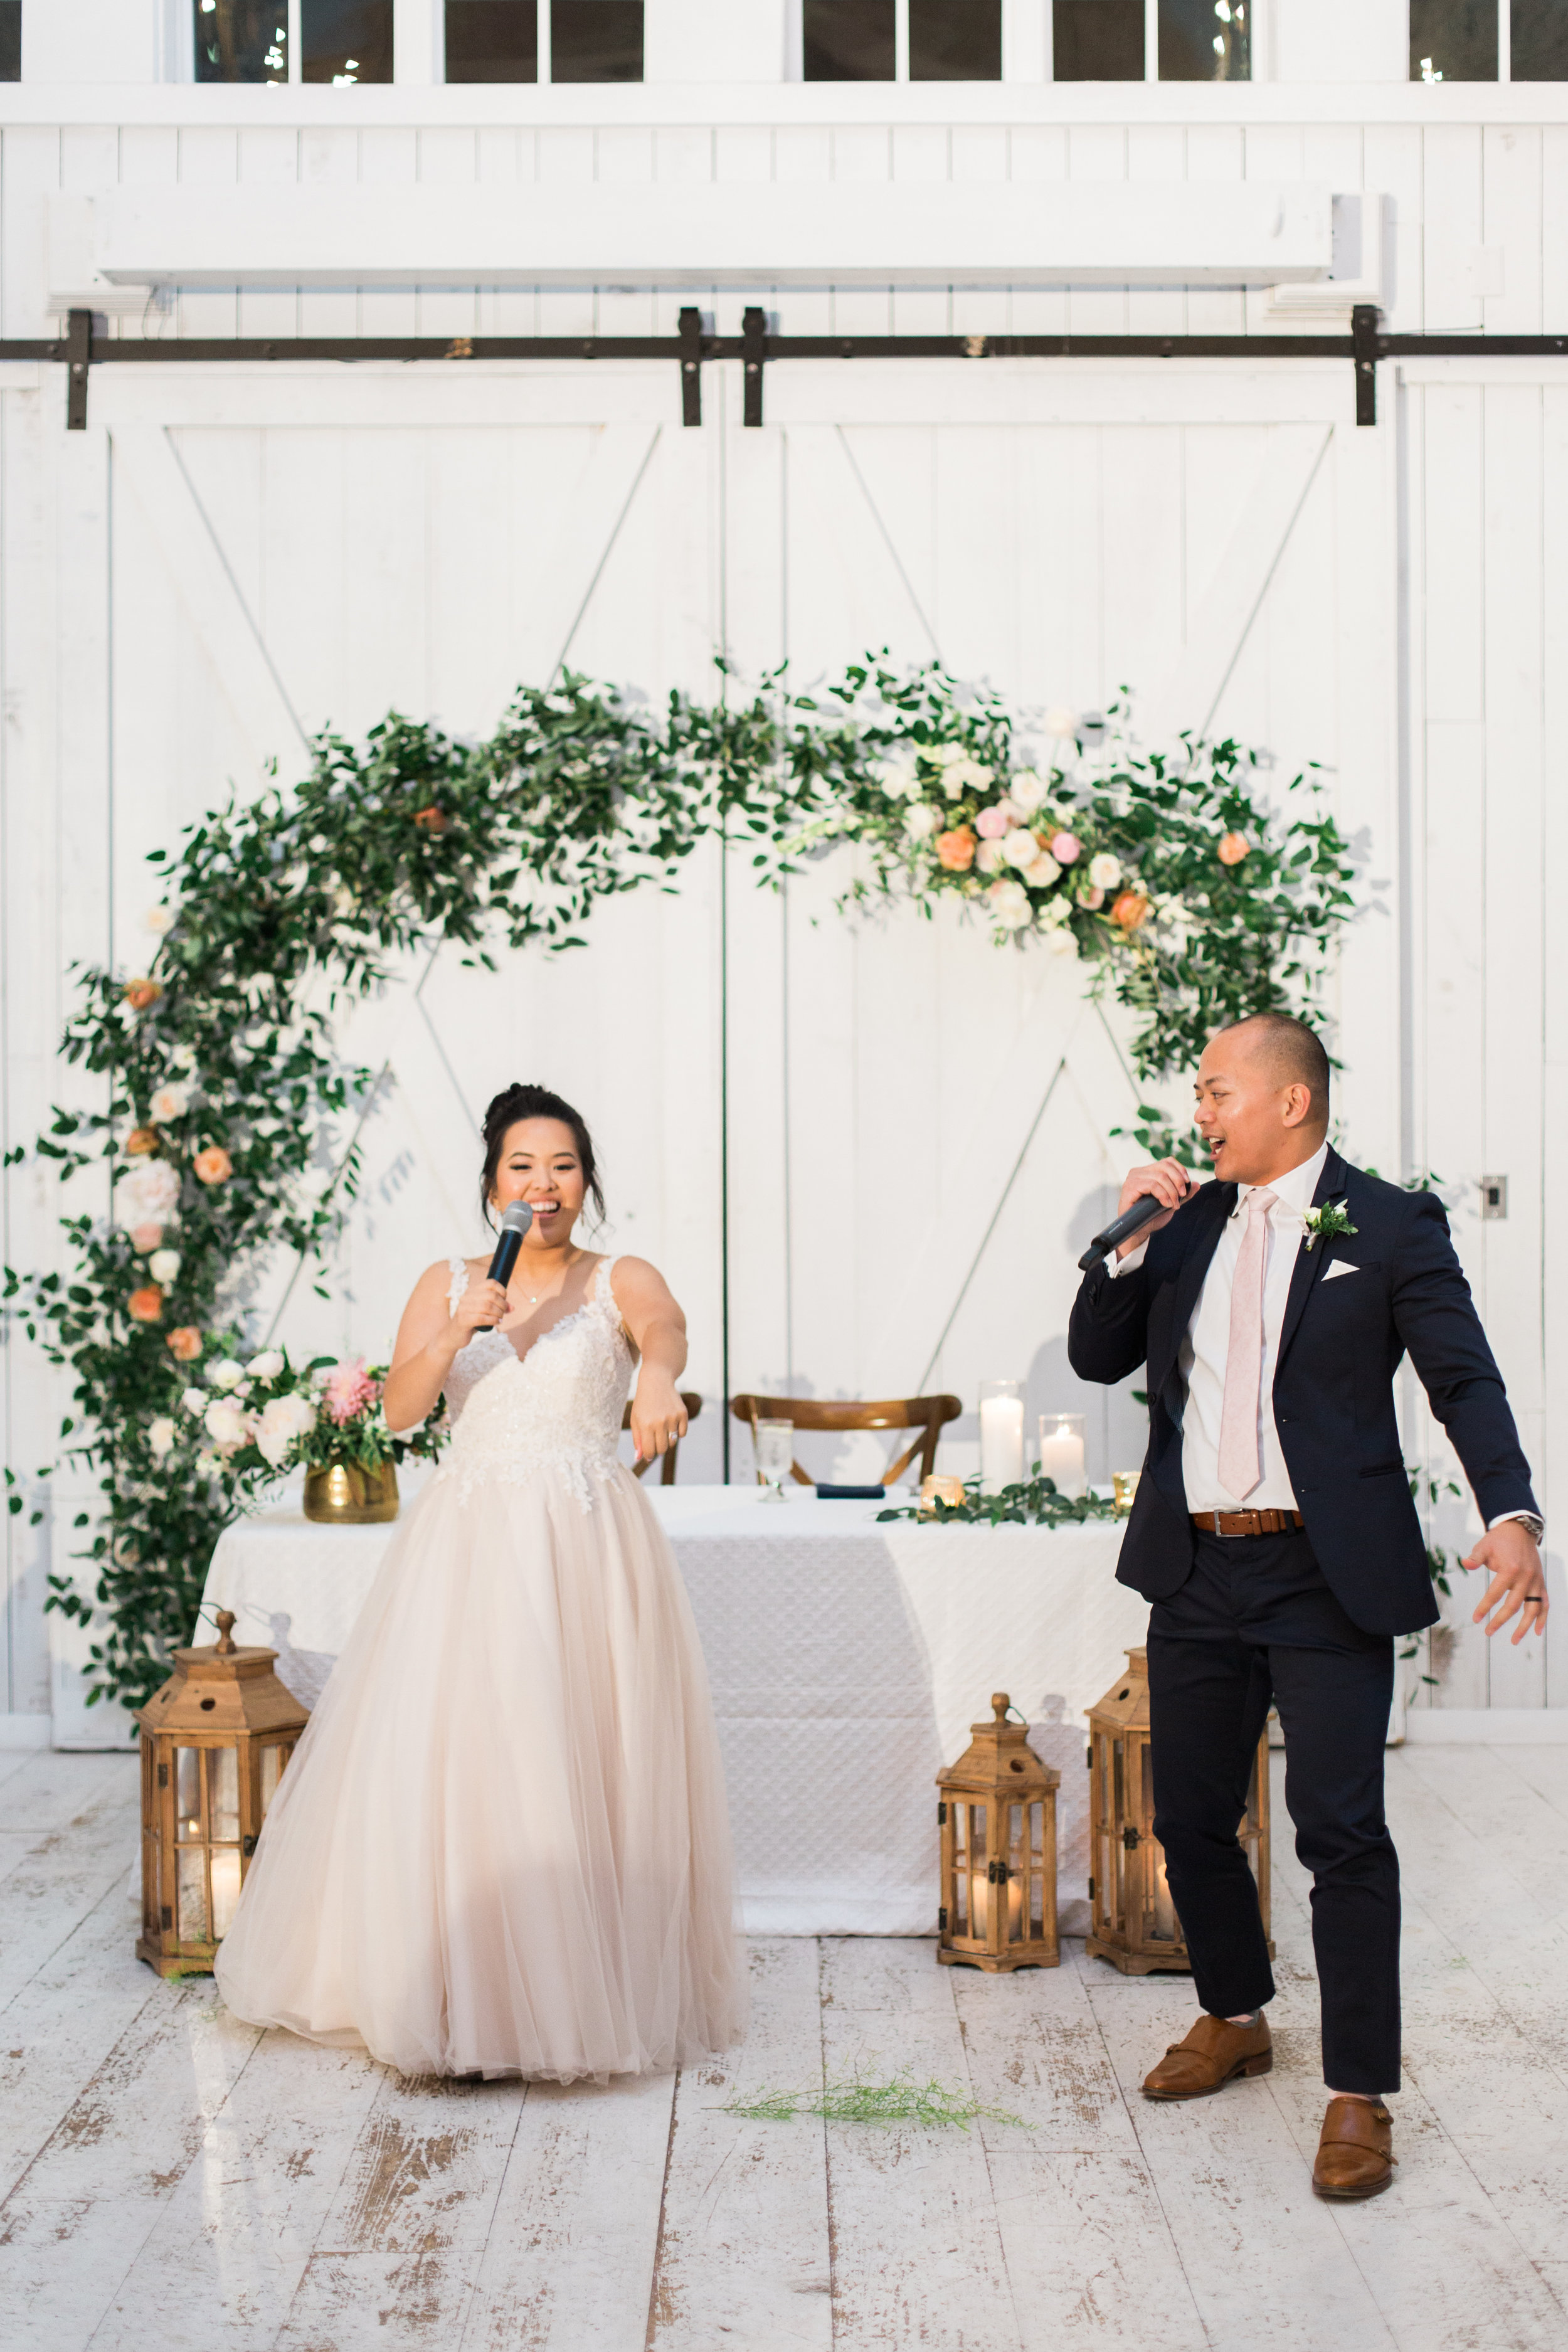 Lucy+JB Wedding_873 copy.JPG